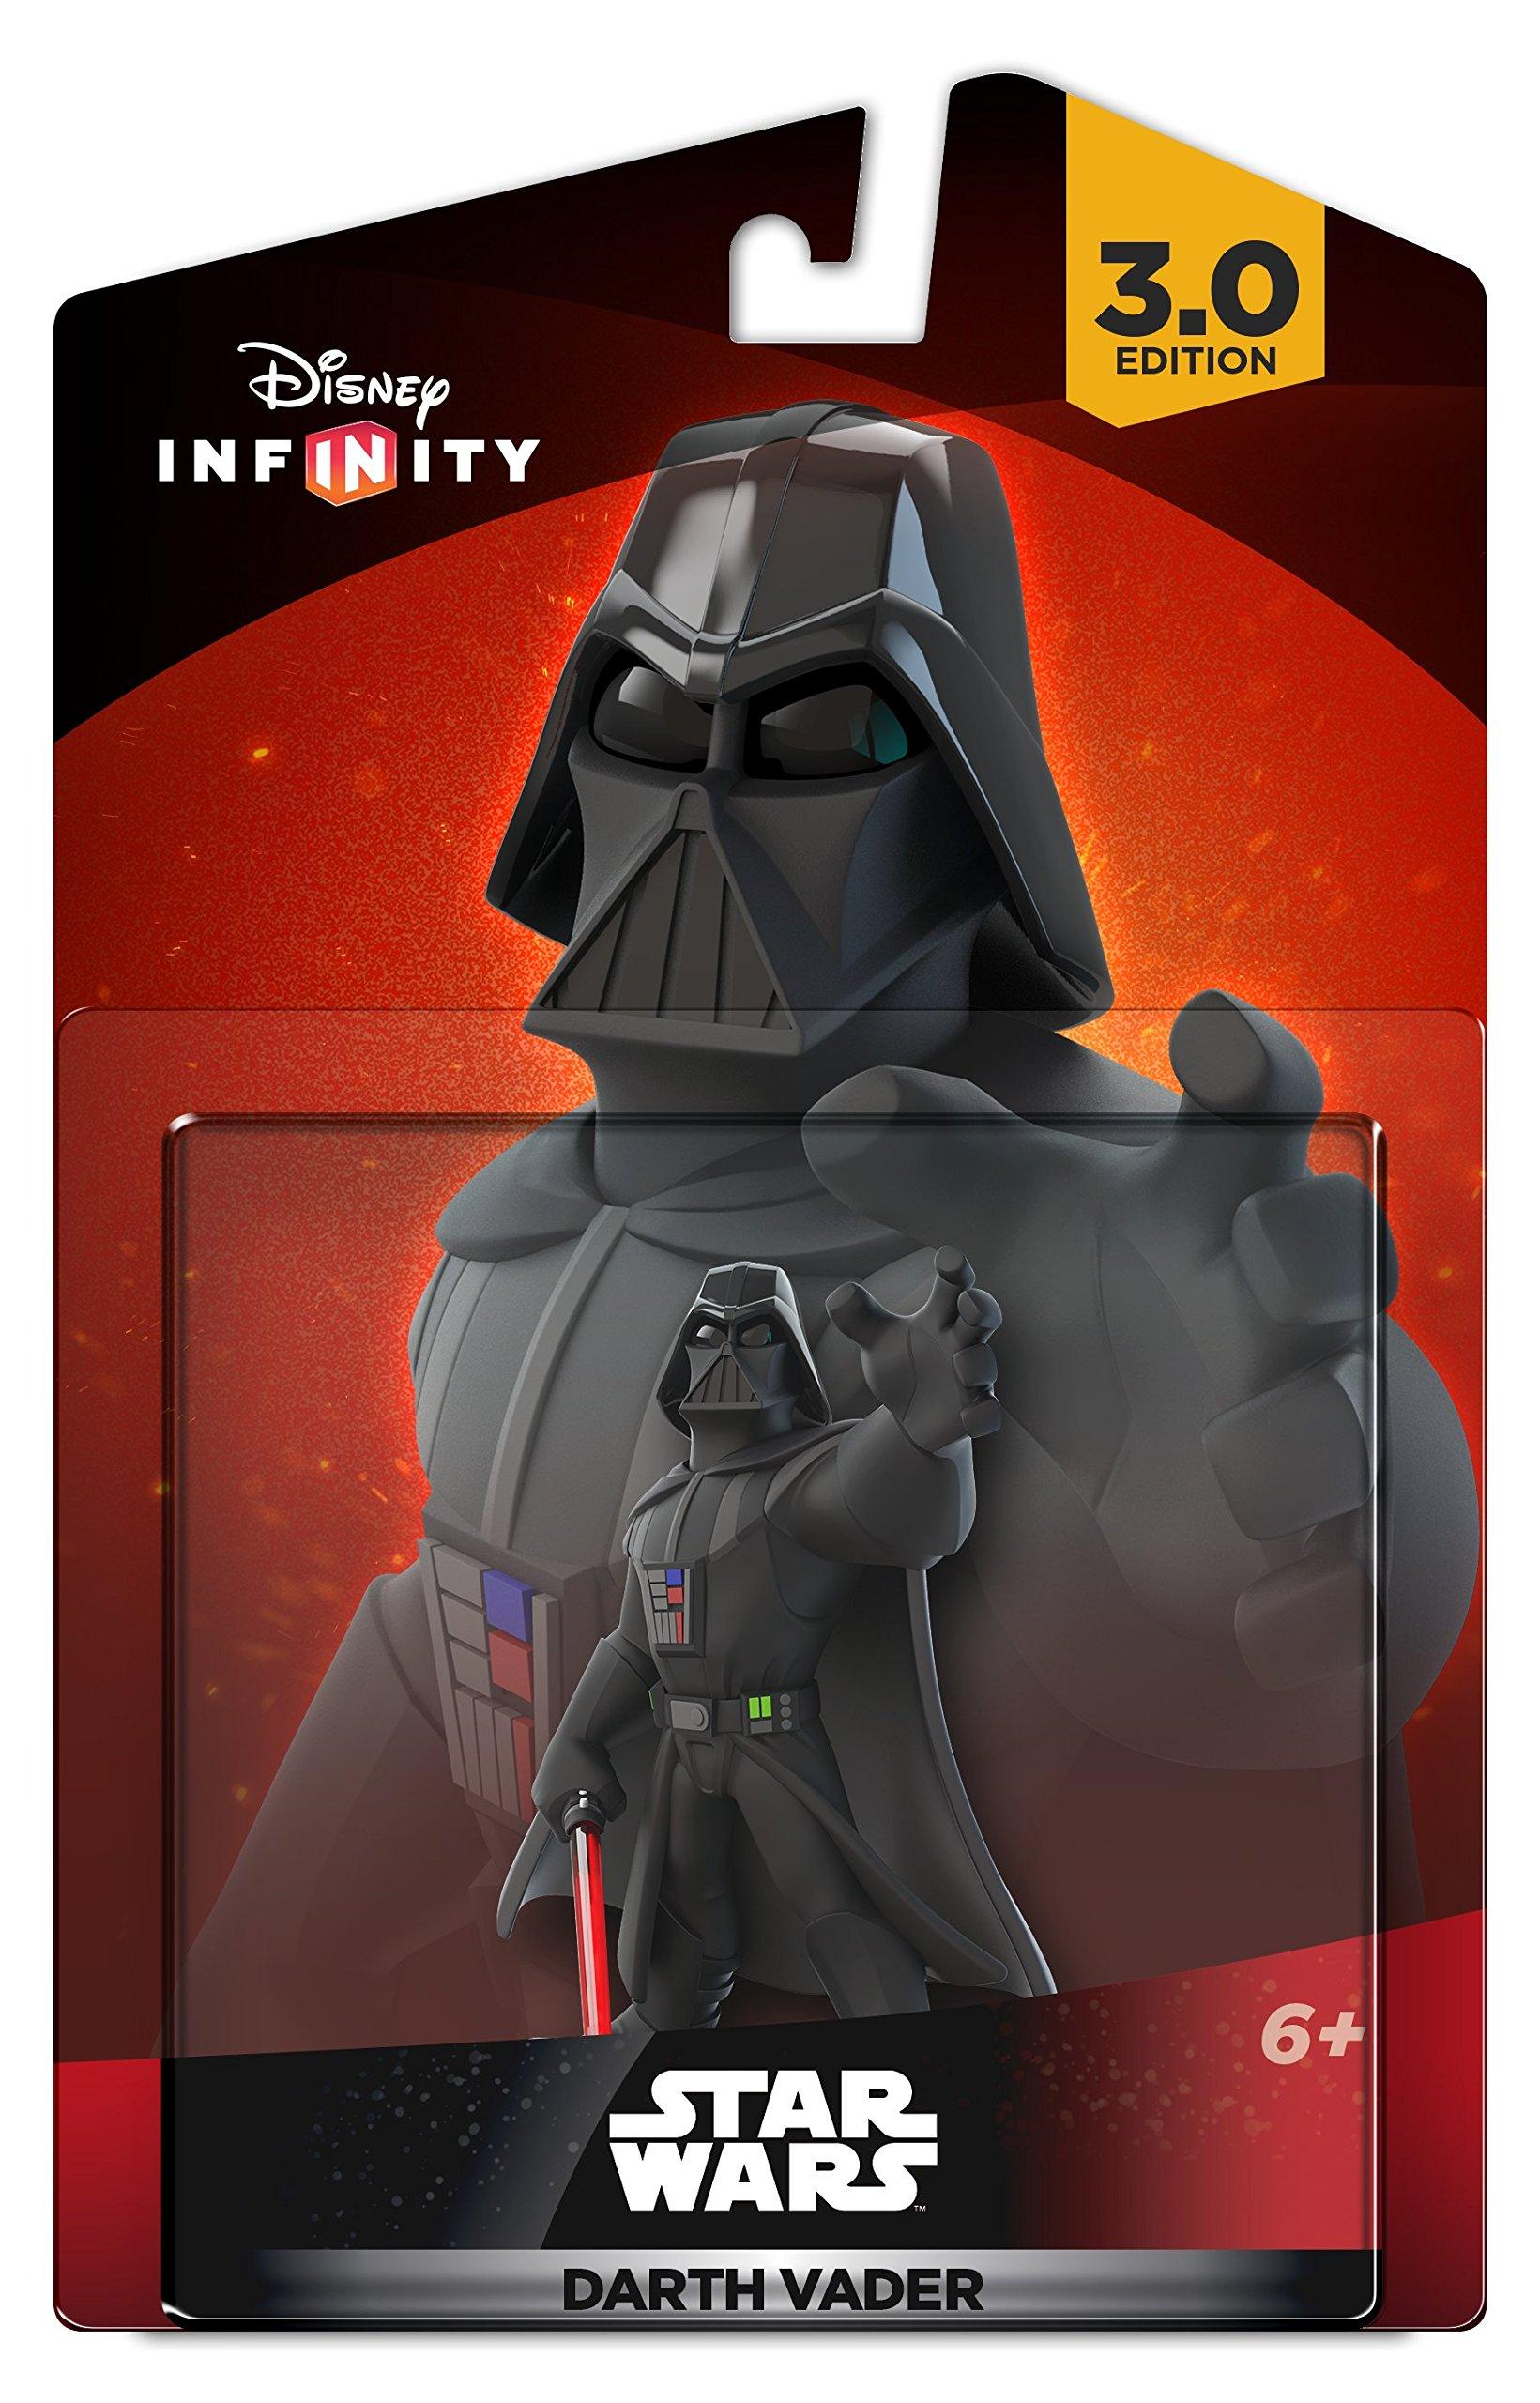 Disney Infinity 3.0 Edition: Star Wars Darth Vader Figure